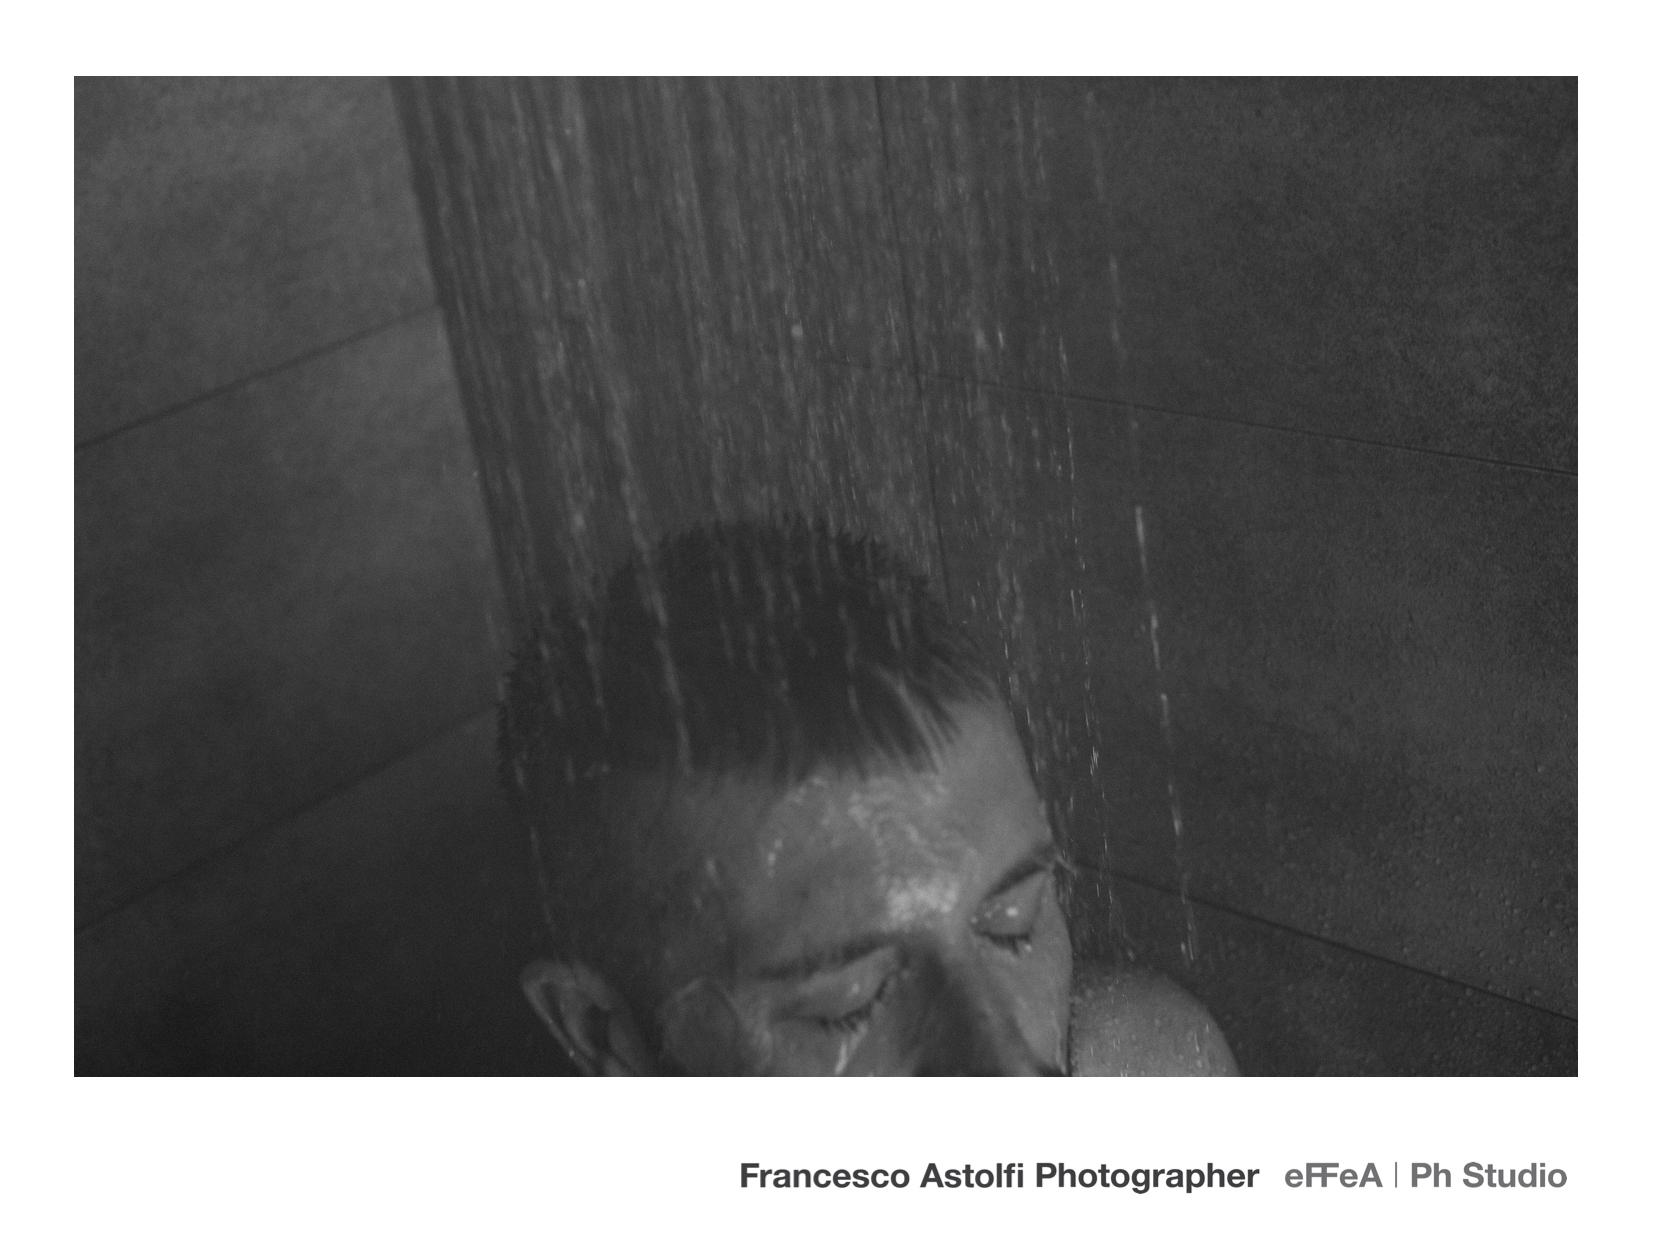 009 - ANDREA S. - Photo by Francesco Astolfi